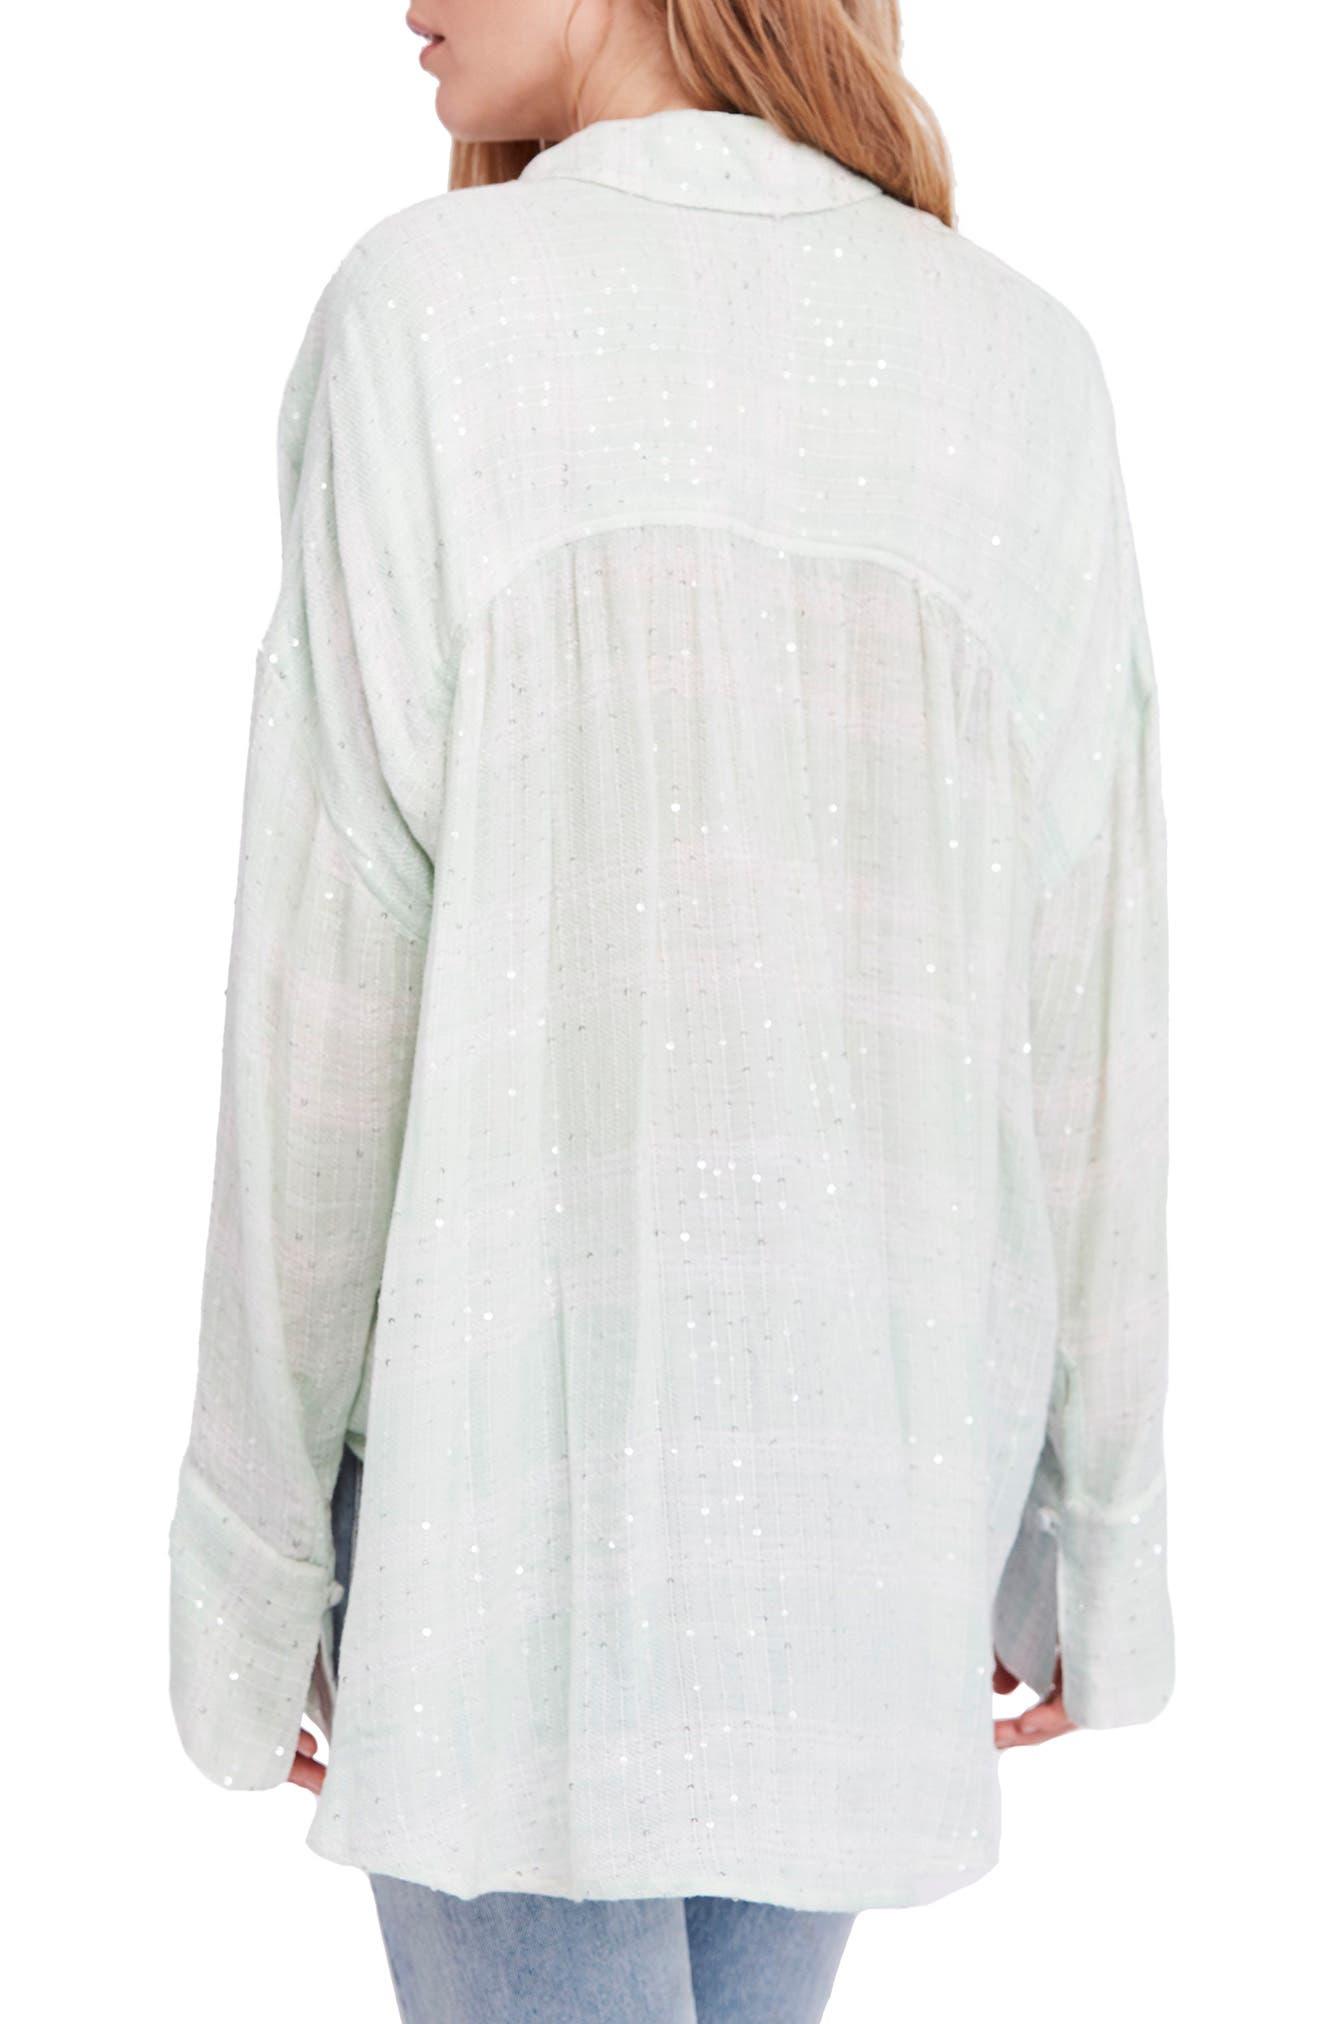 Fearless Love Bell Sleeve Shirt,                             Alternate thumbnail 2, color,                             MINT